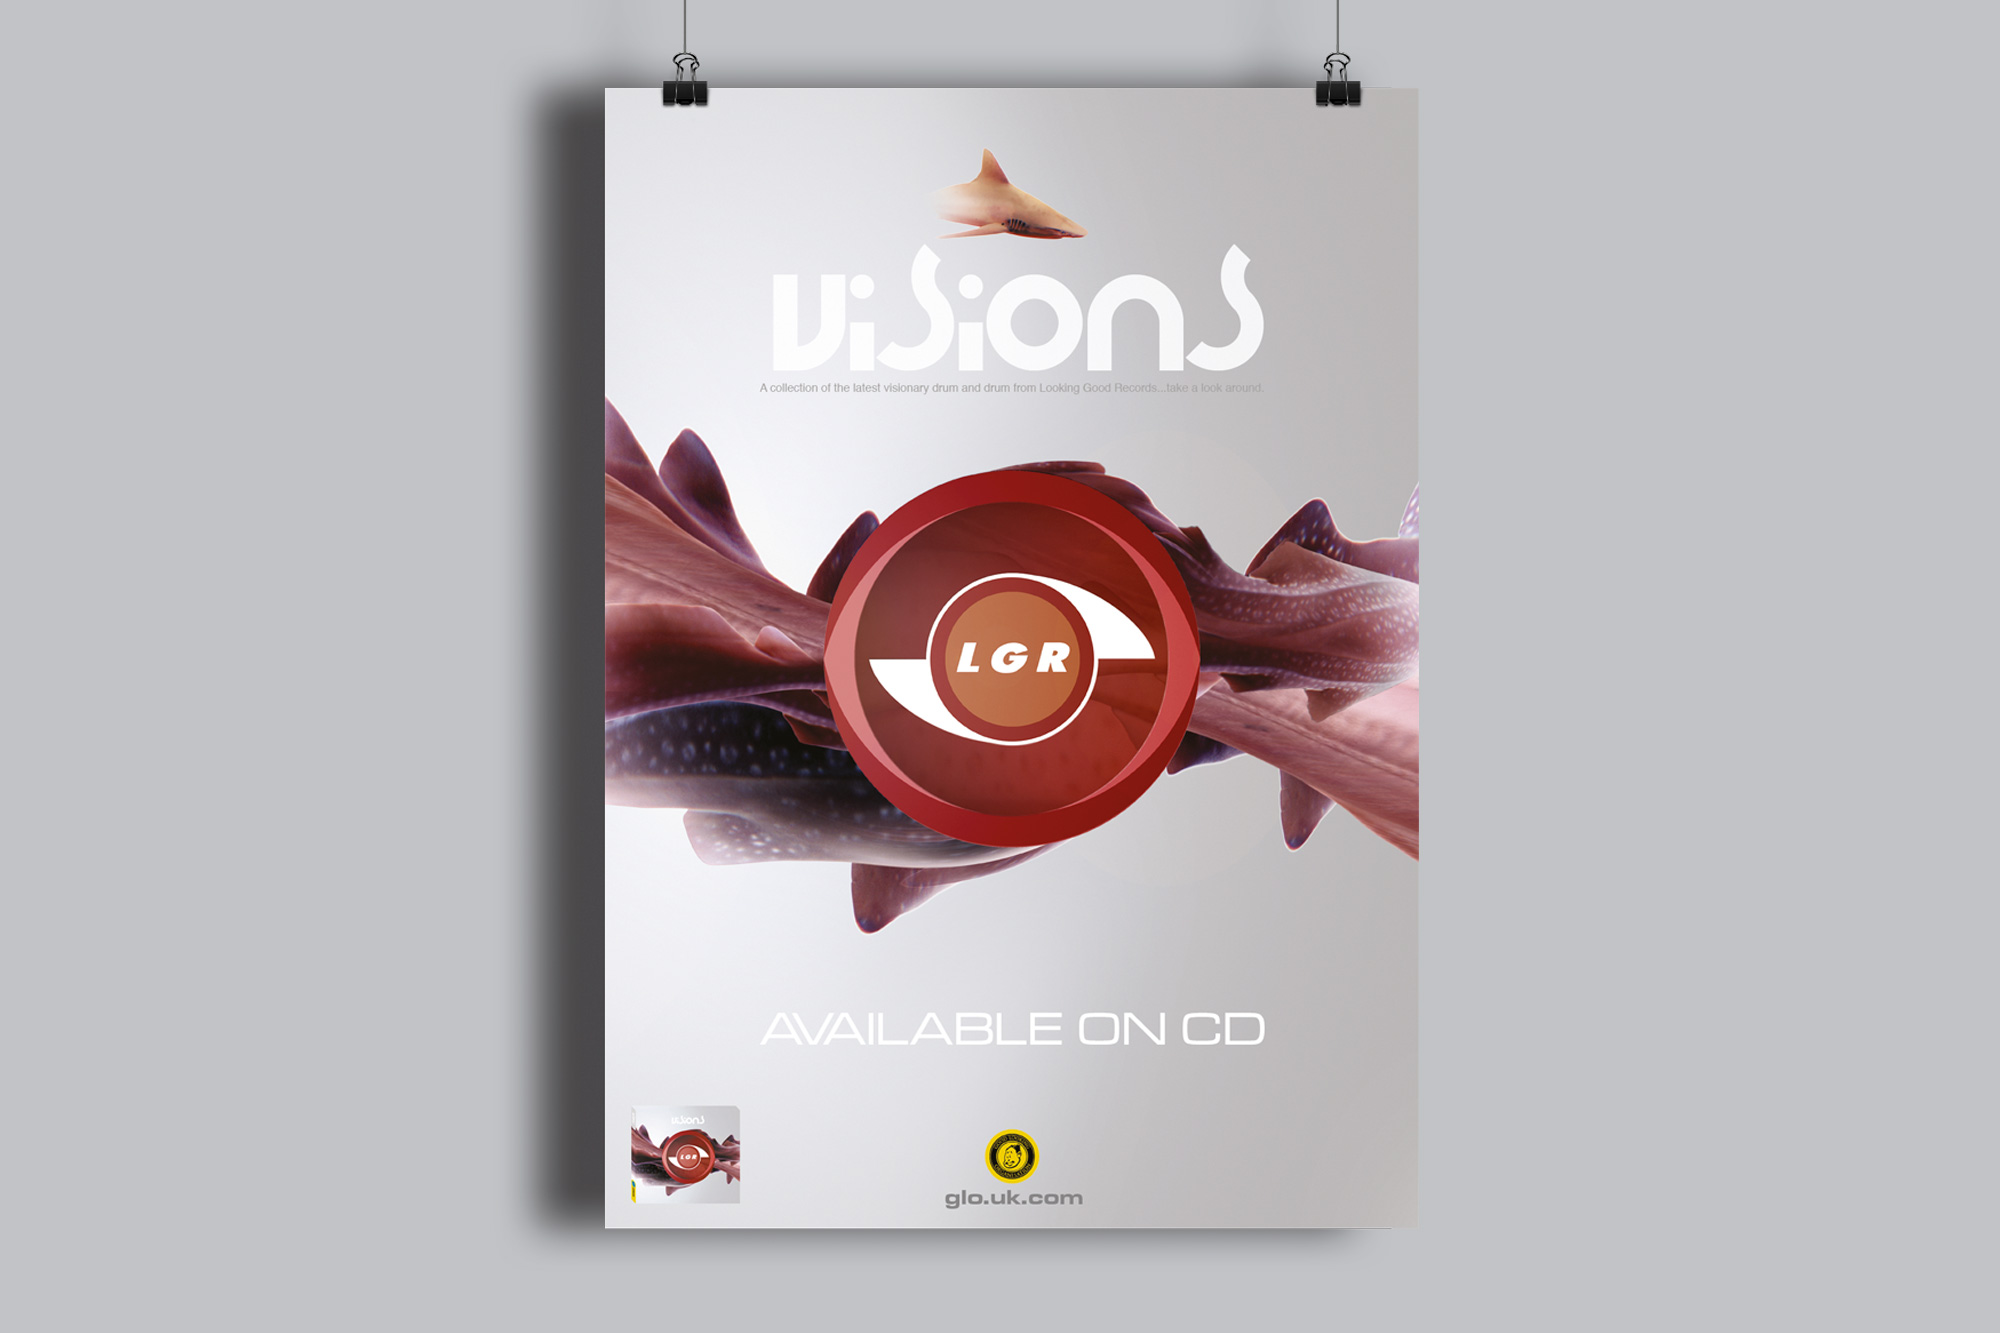 gareth-paul-jones-studio-design-looking-good-records-lp-visions-case-study-06